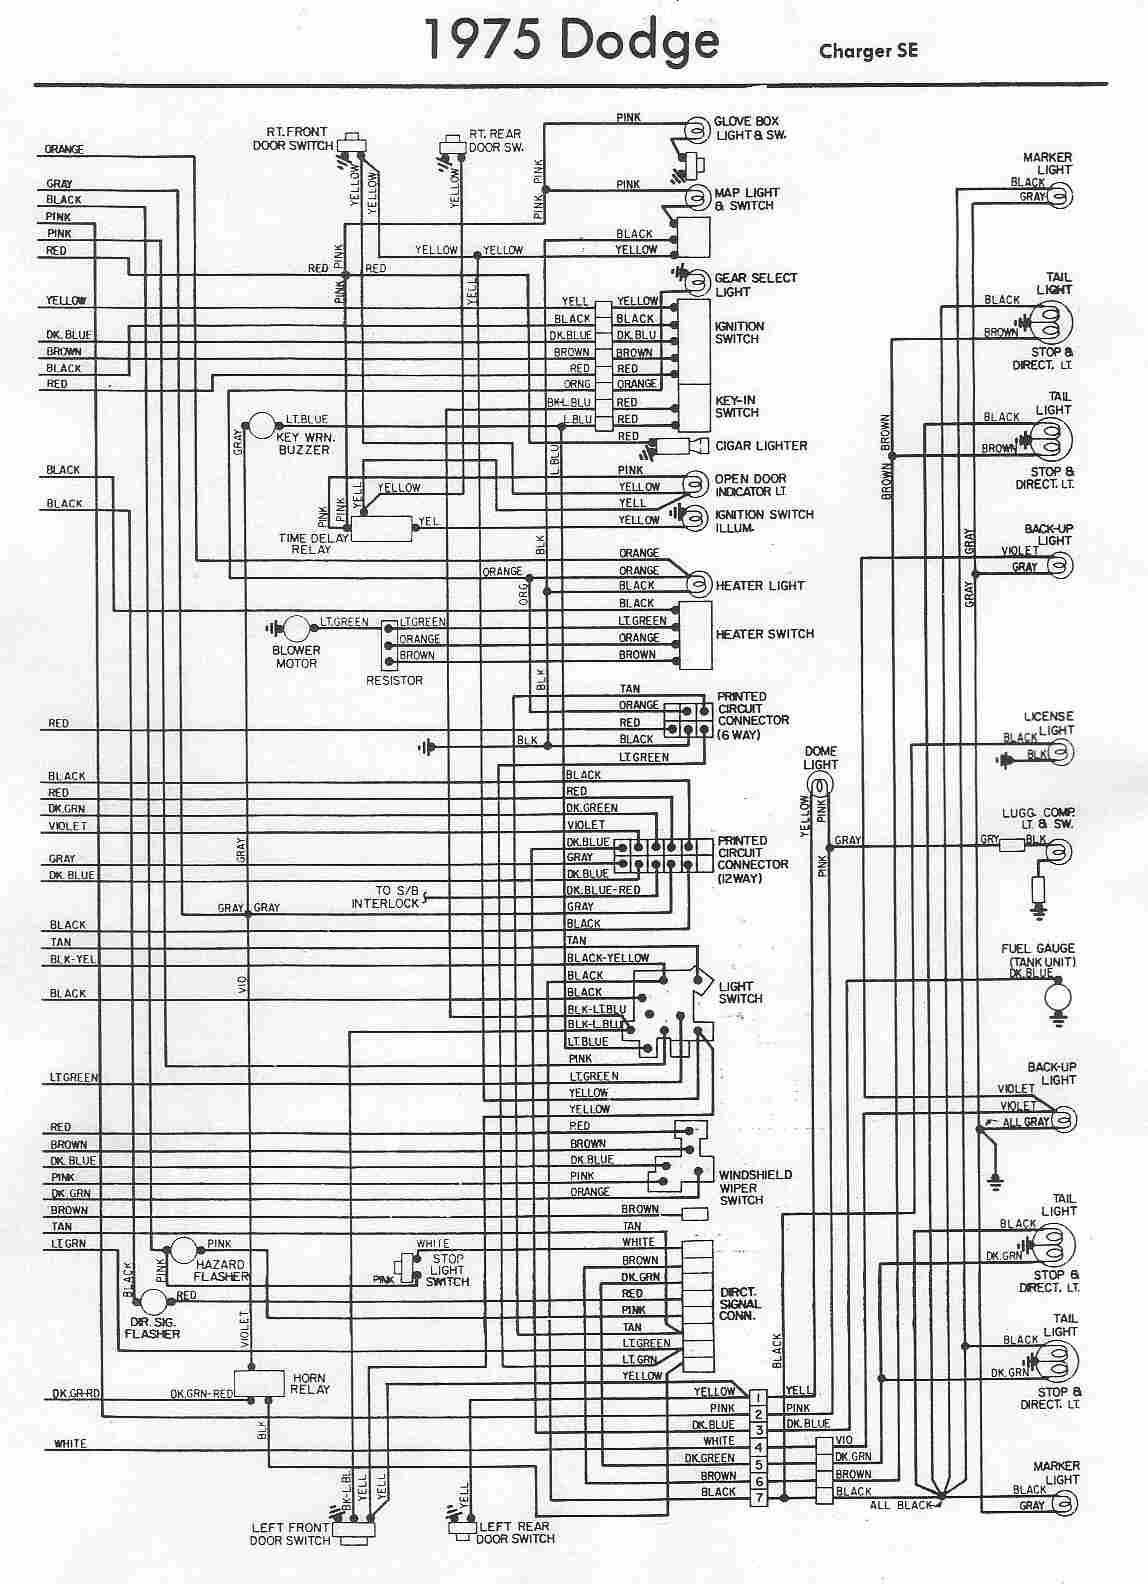 medium resolution of 1976 dodge wiring diagram wiring diagram blog dodge nitro wiring diagrams dodge wiring diagrams